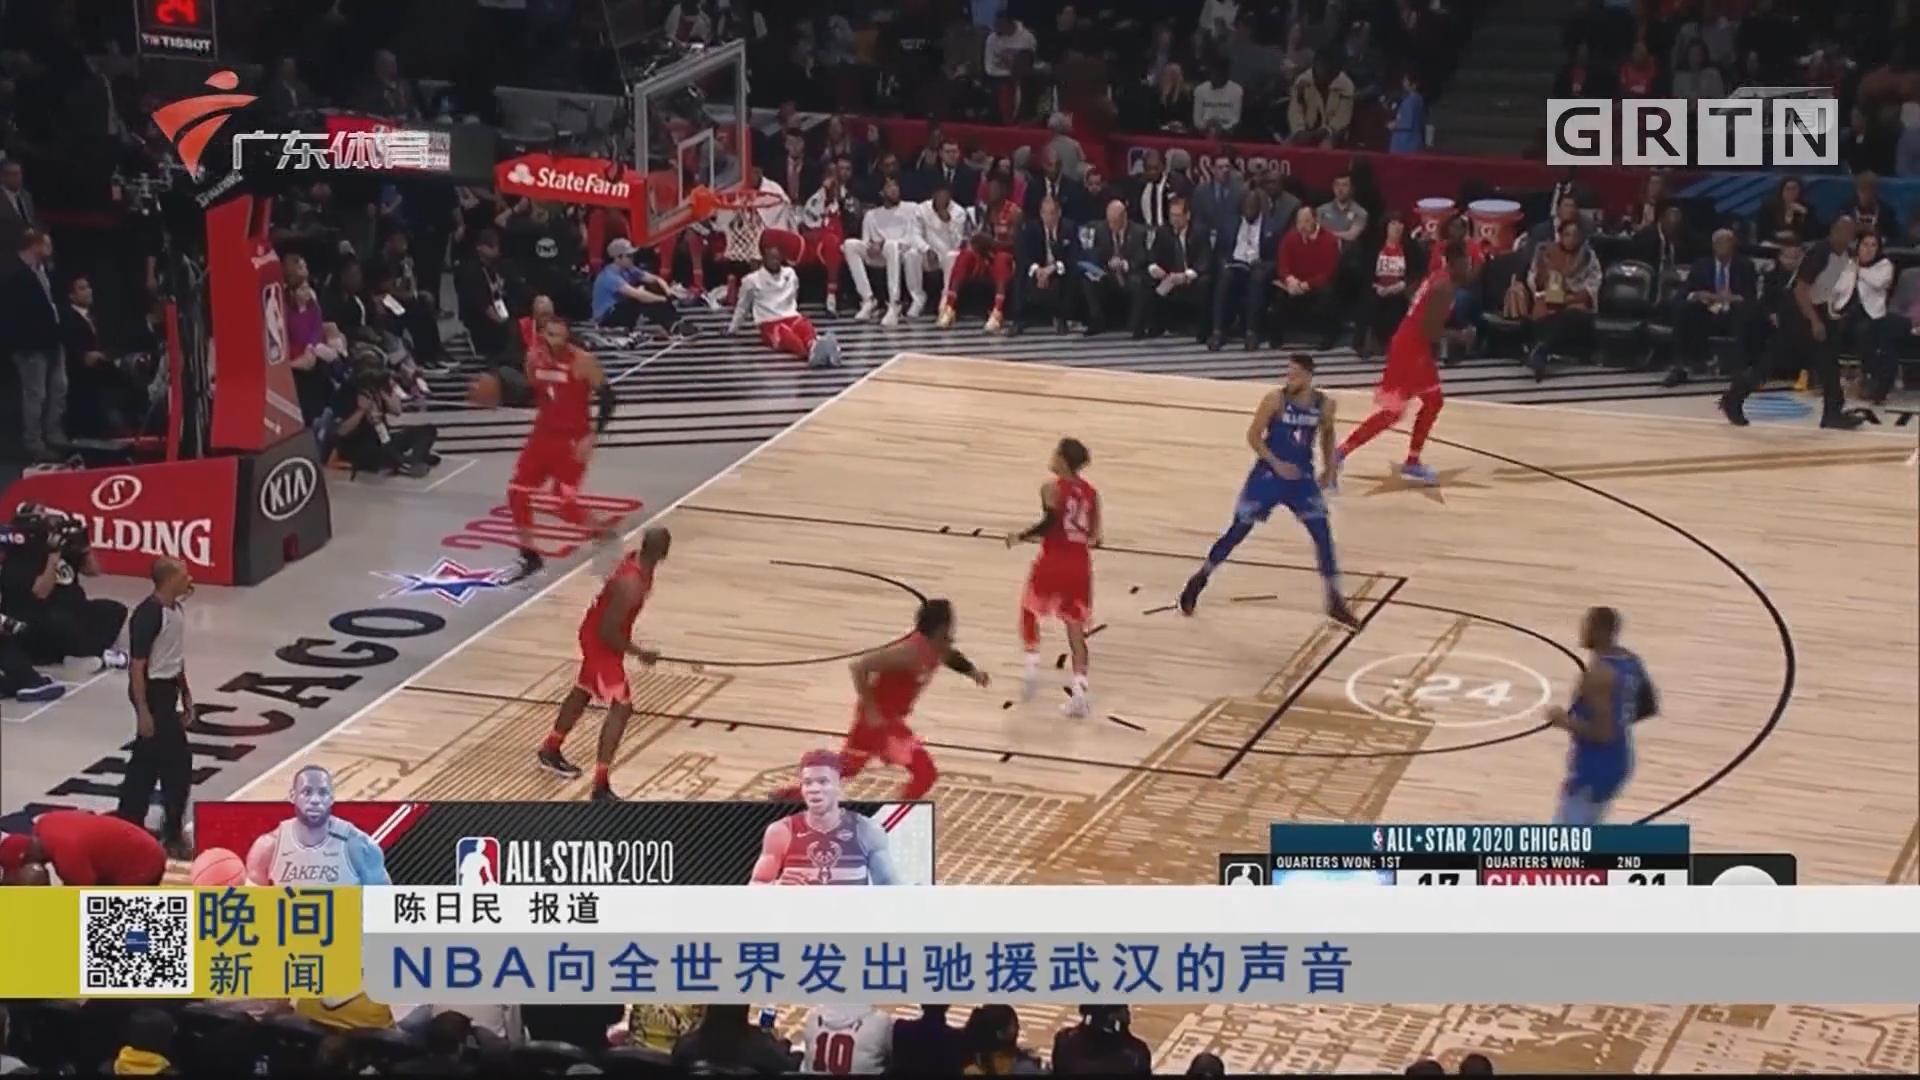 NBA向全世界发出驰援武汉的声音